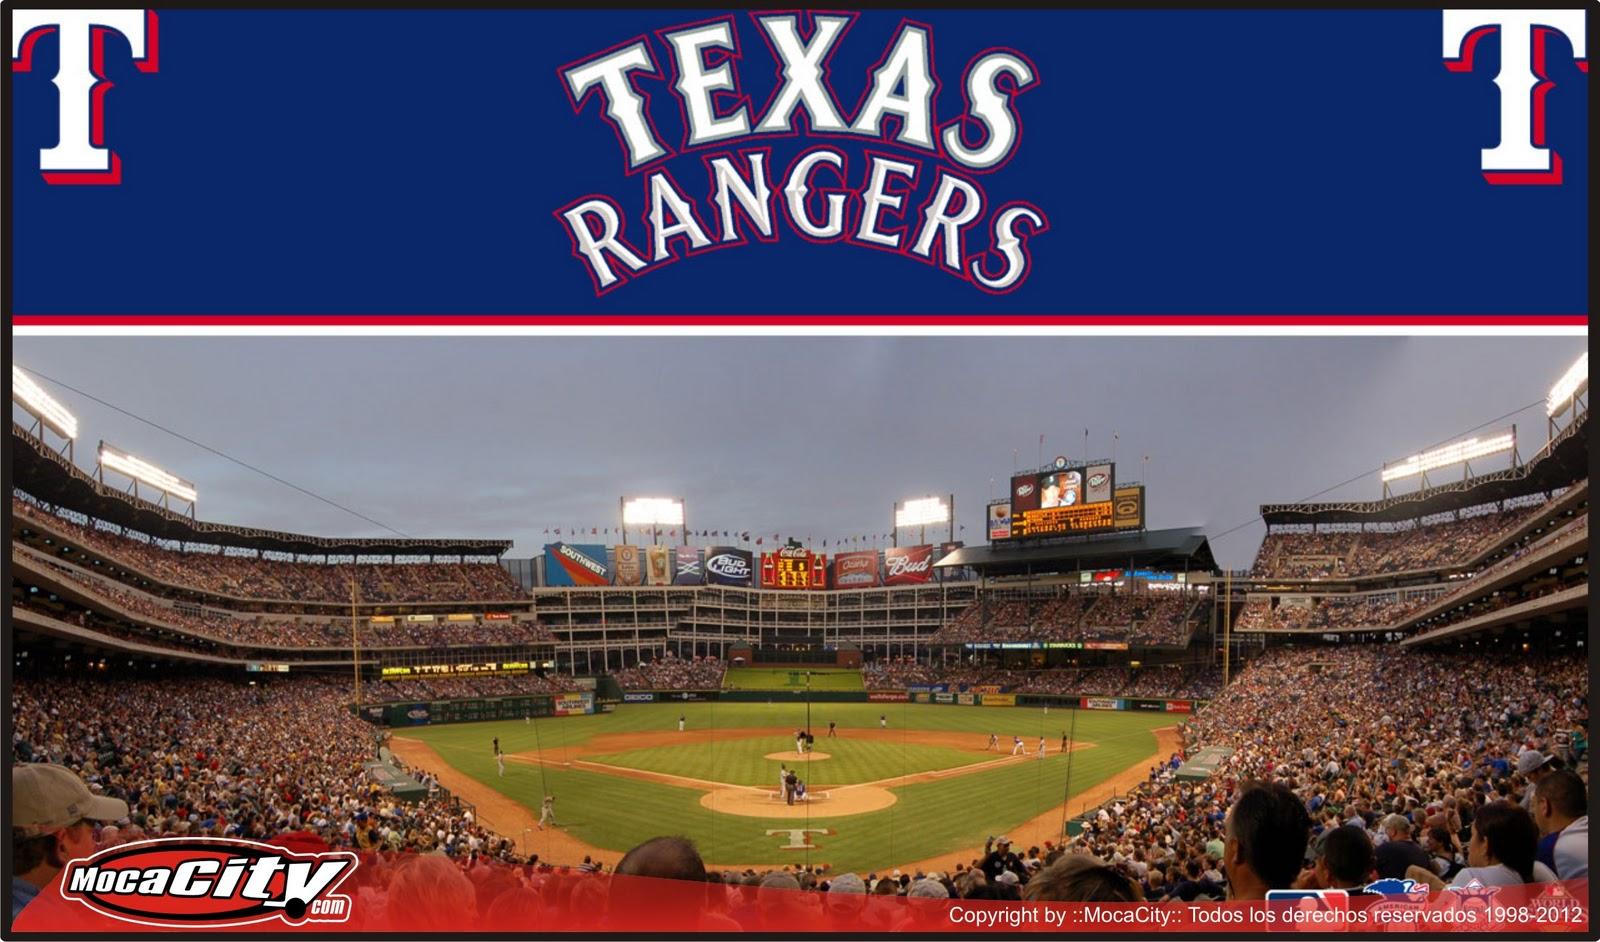 http://3.bp.blogspot.com/-9FjzEgcfXf0/Tqtu4CTOkxI/AAAAAAAADgg/cmI29ICPCYo/s1600/texas+ranger+world+champions+mlb+2011.jpg